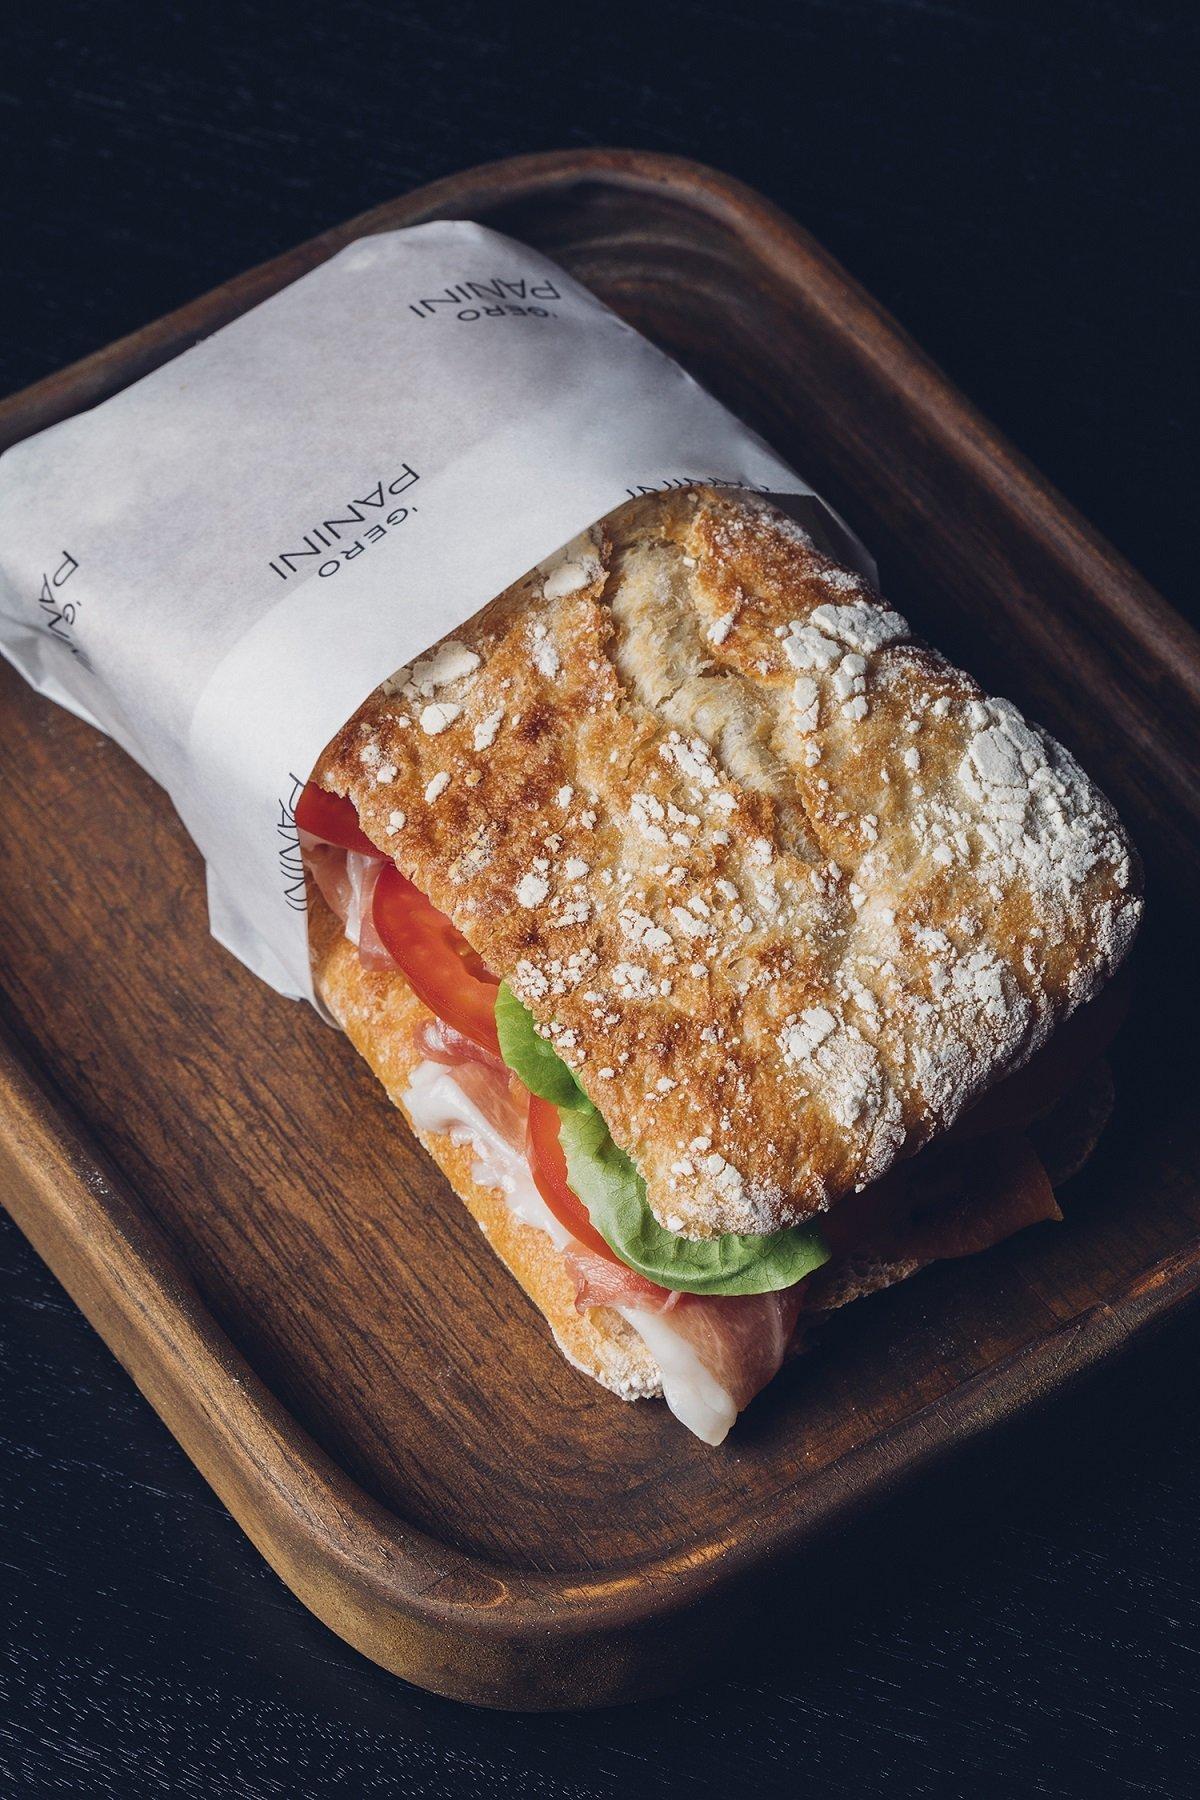 Panini de presunto cru com queijo brie, alface e tomate, do Gero Panini